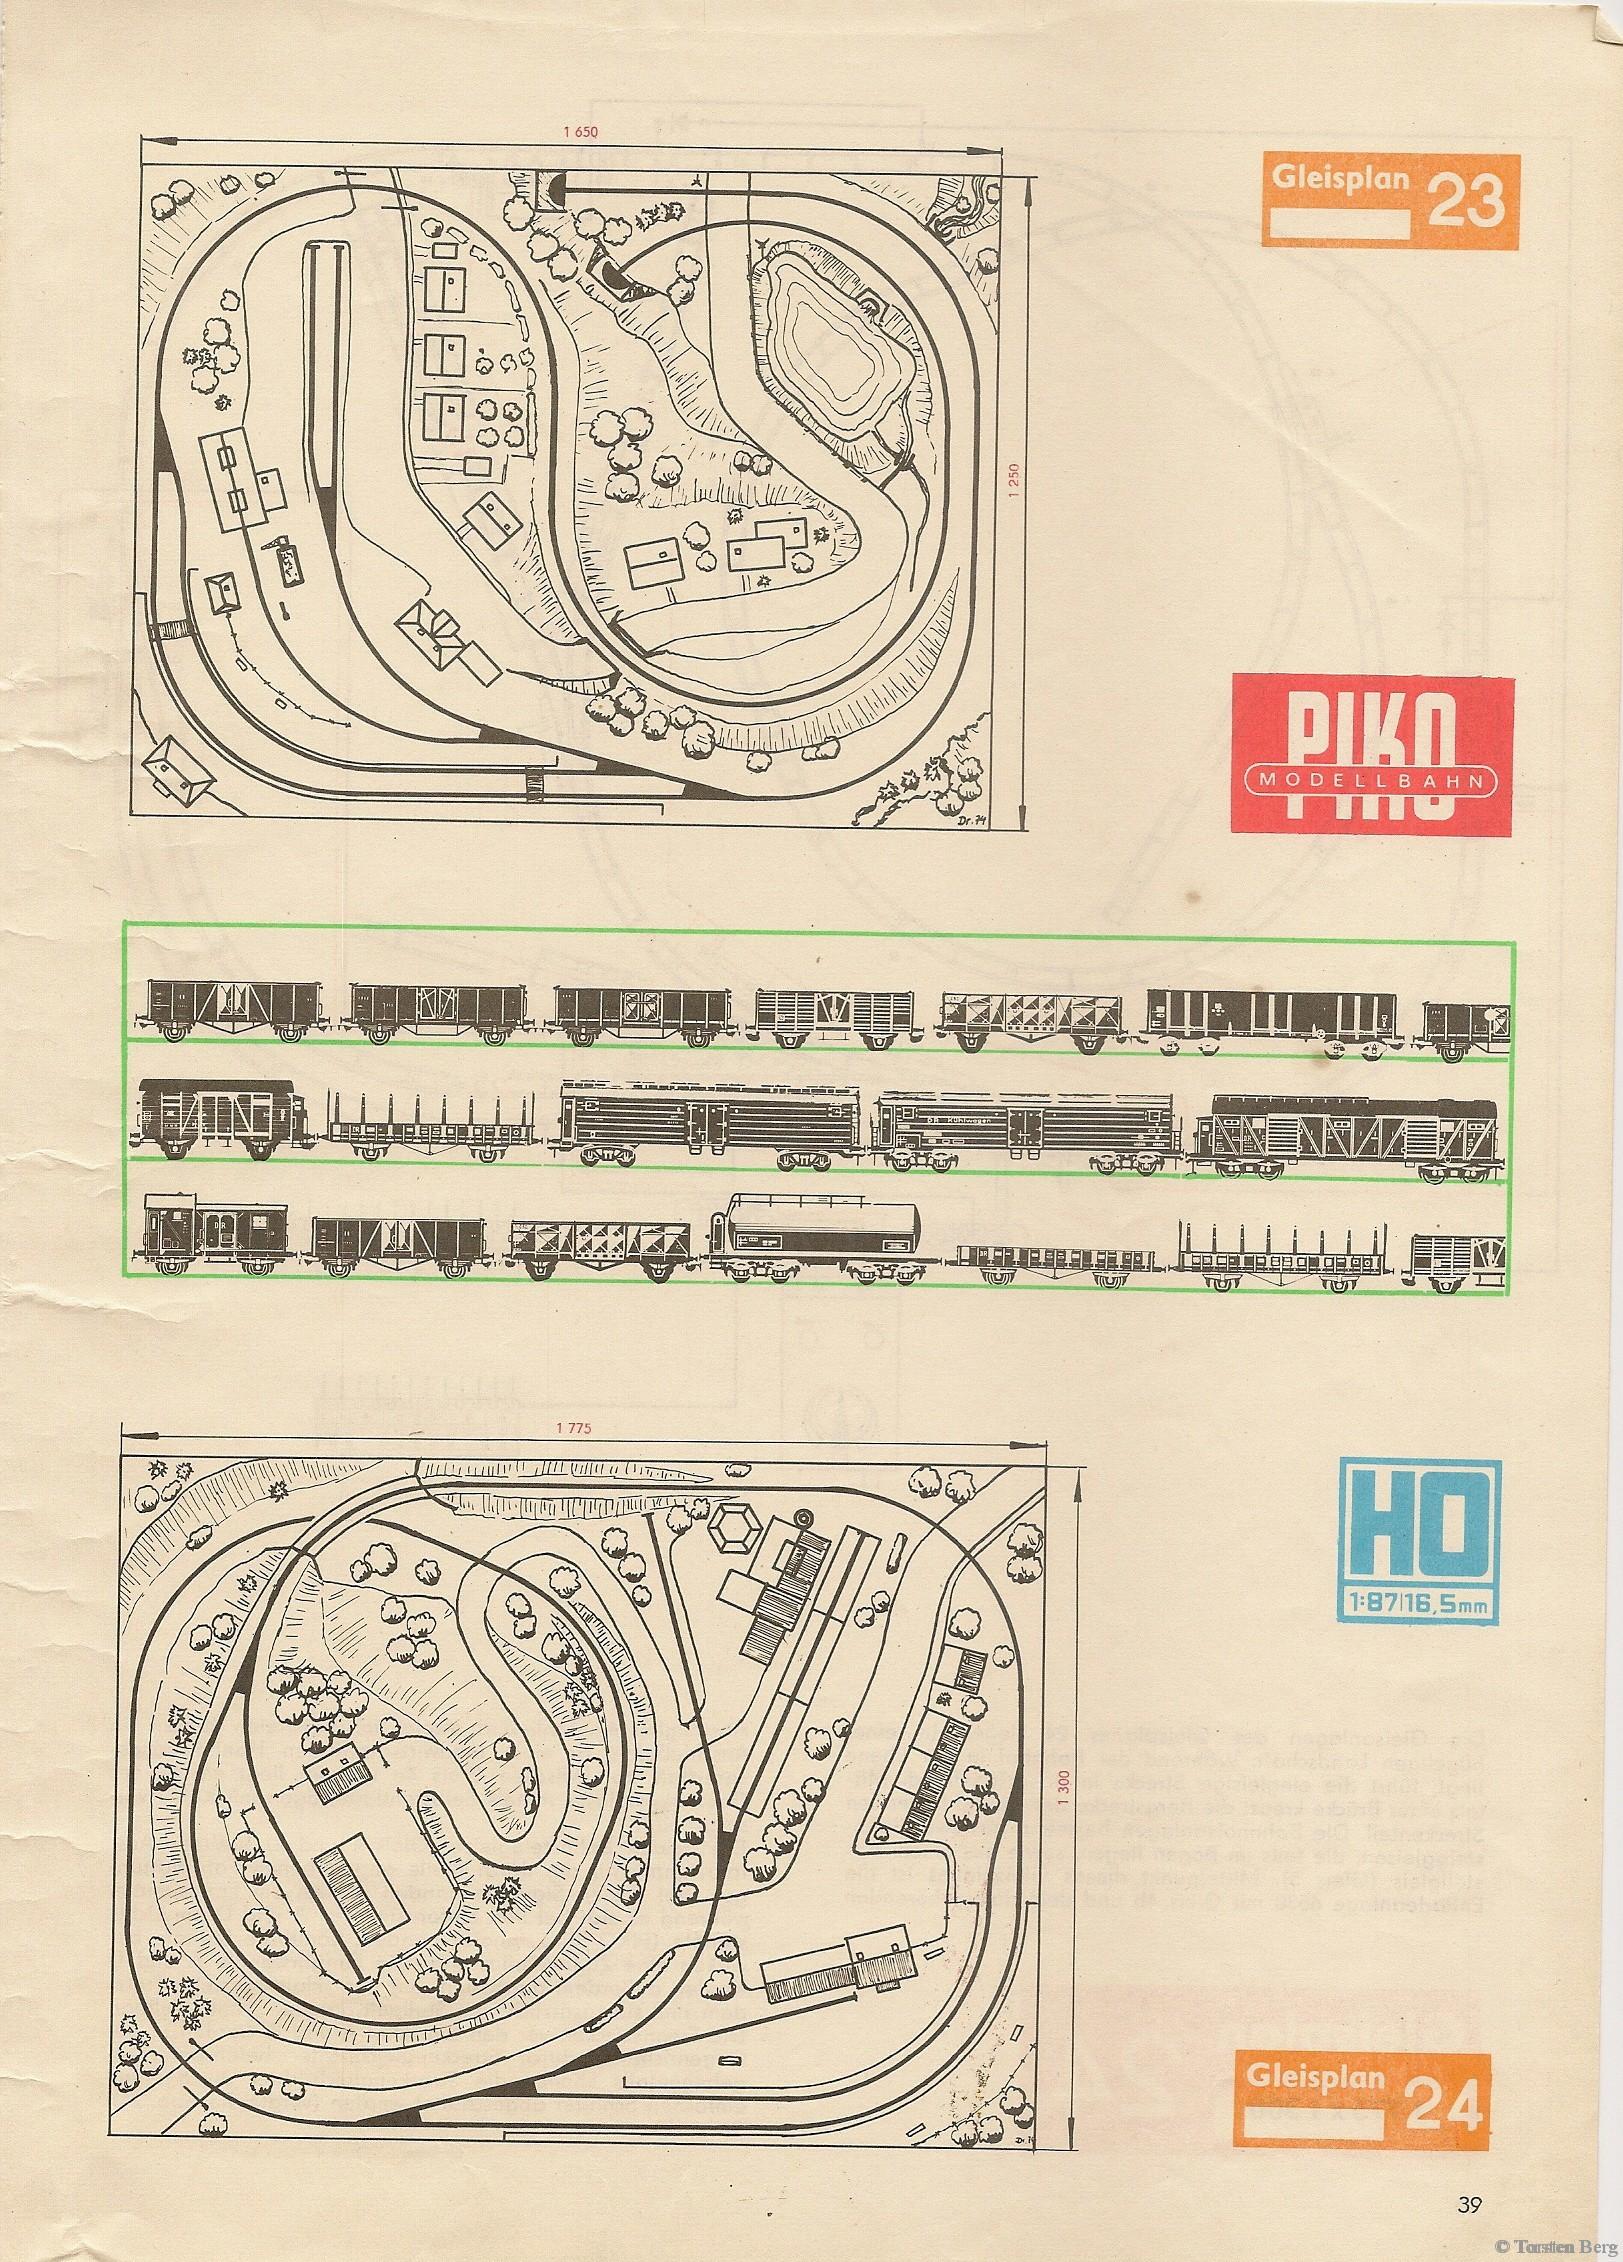 40 PIKO Standardgleis-Gleisplan 23-24